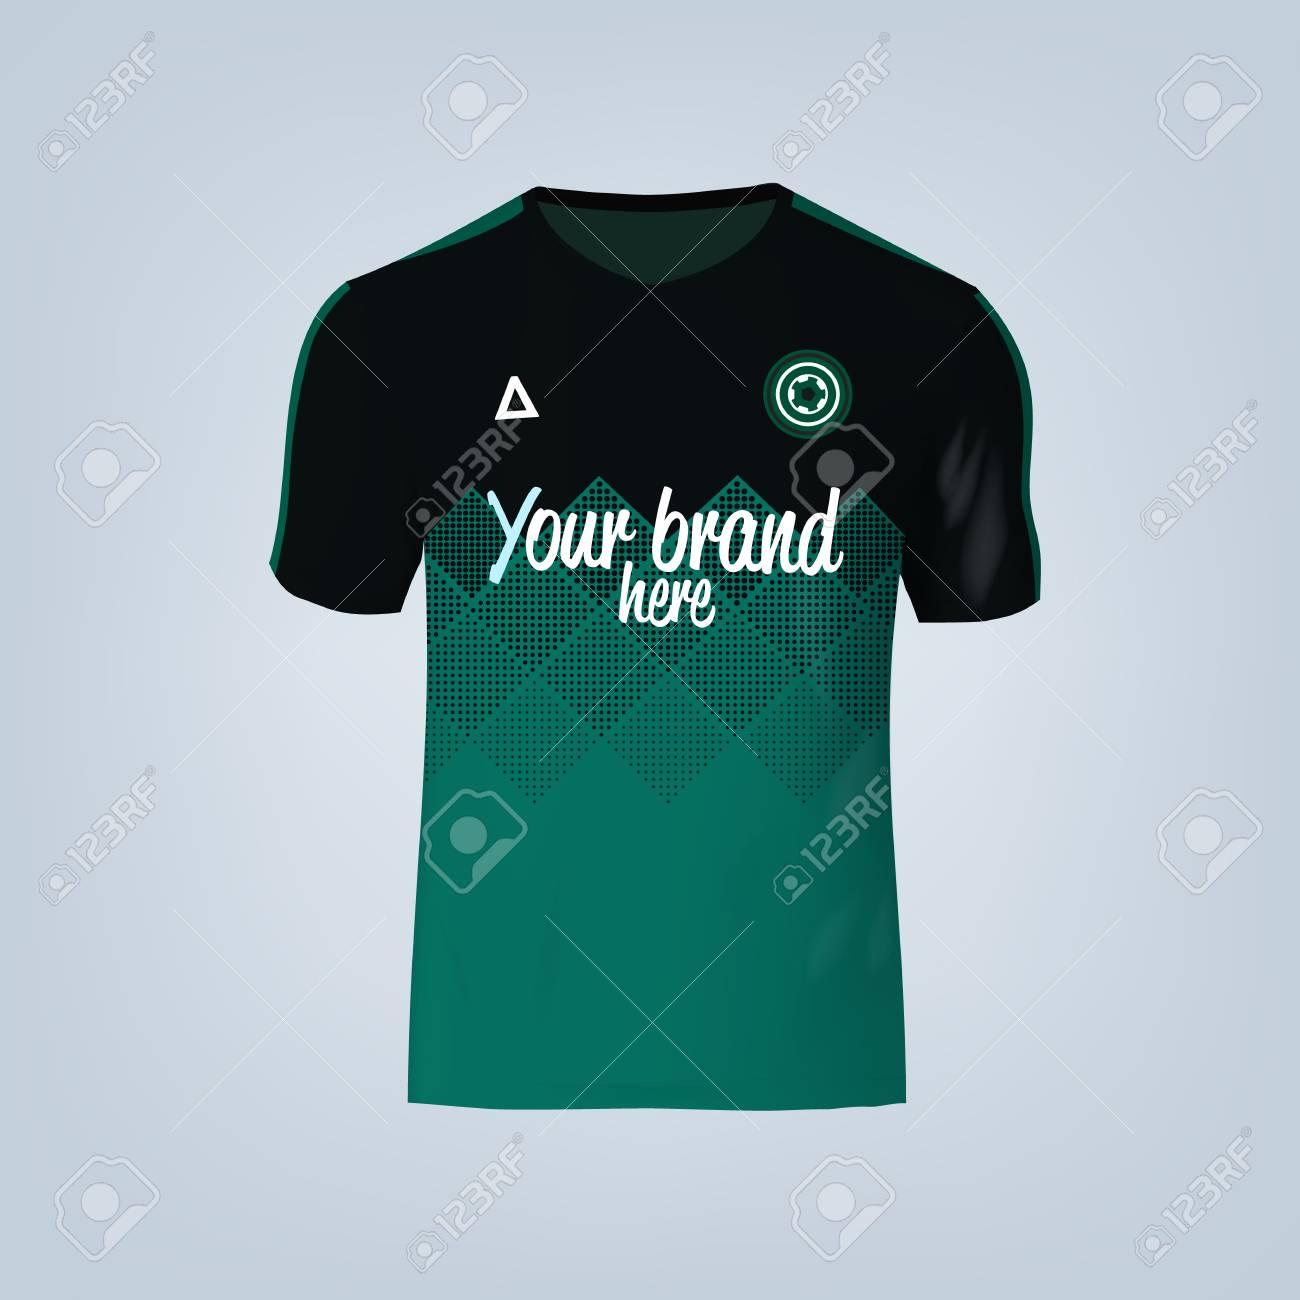 Vector illustration of football t-shirt template. - 84013209